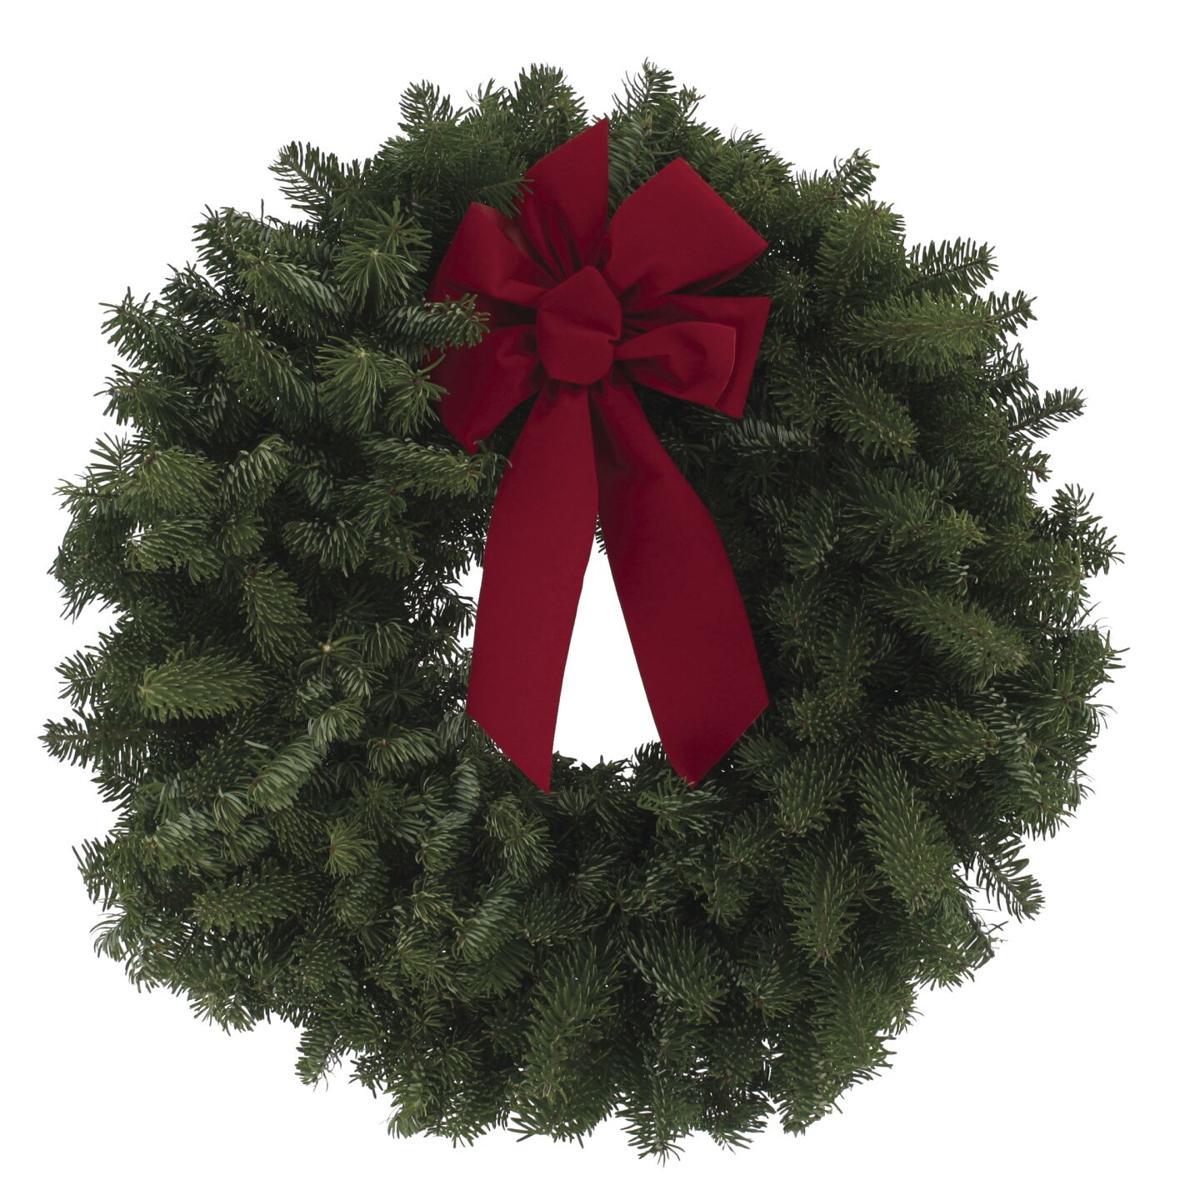 Dothan Wreaths Across America ceremony to honor fallen veterans on Saturday